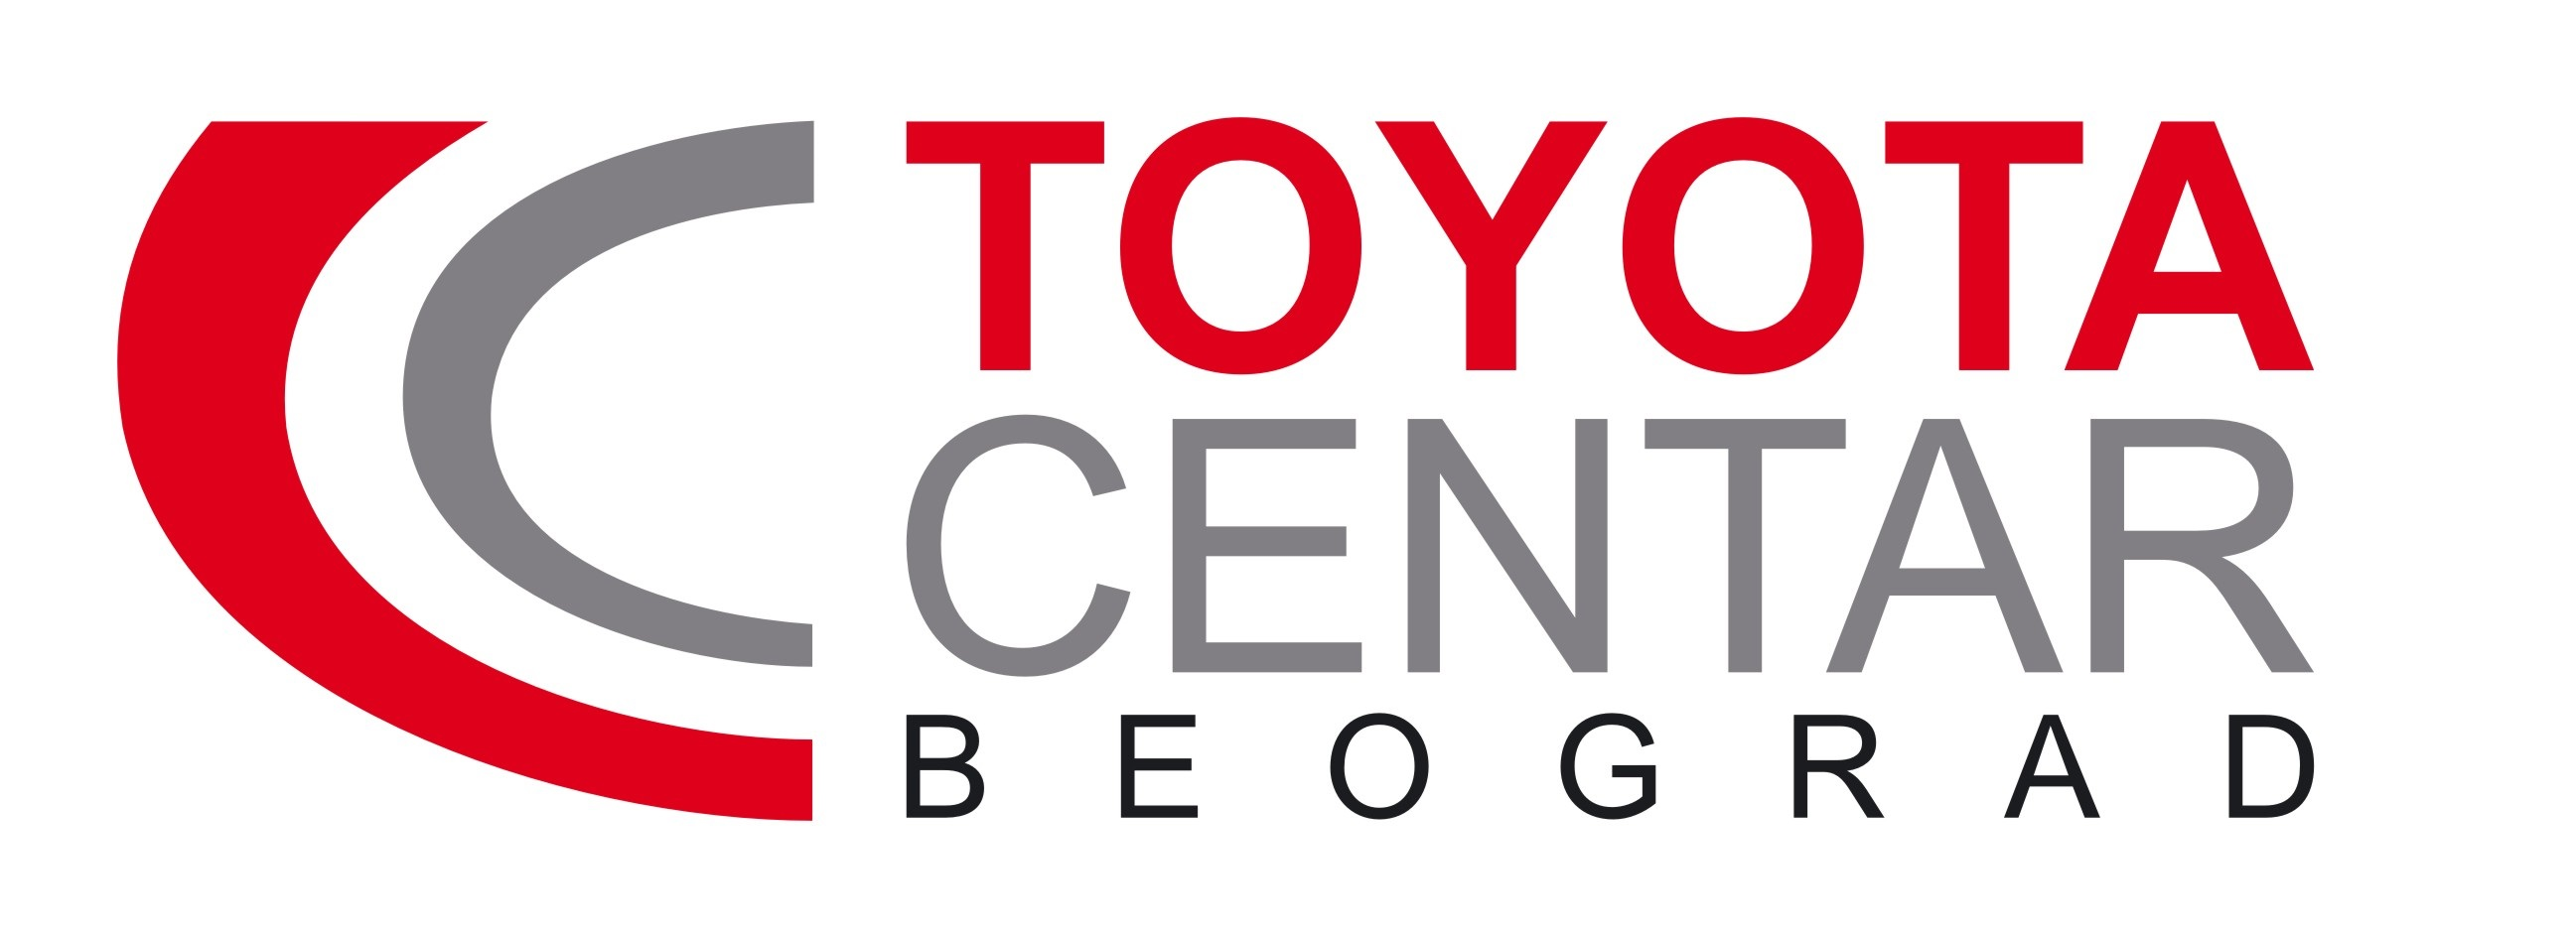 Toyota Centar Beograd